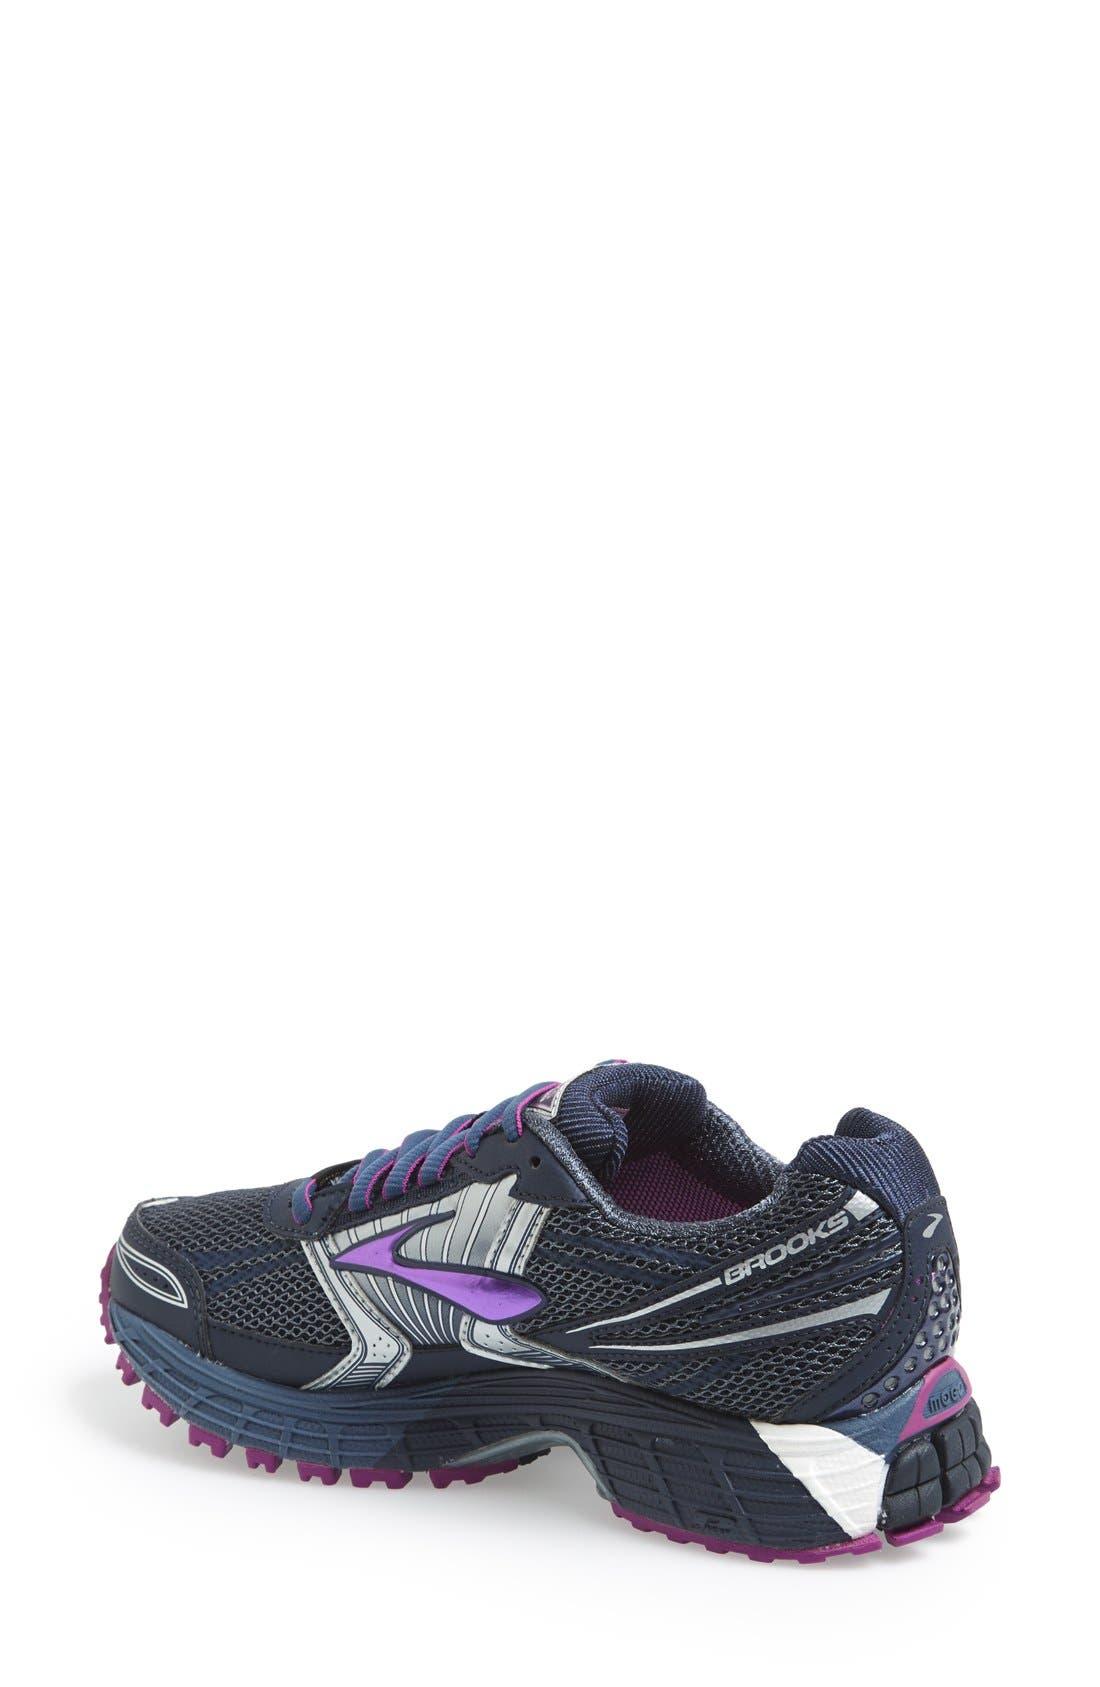 'Adrenaline ASR 11 GTX' Waterproof Running Shoe,                             Alternate thumbnail 3, color,                             021